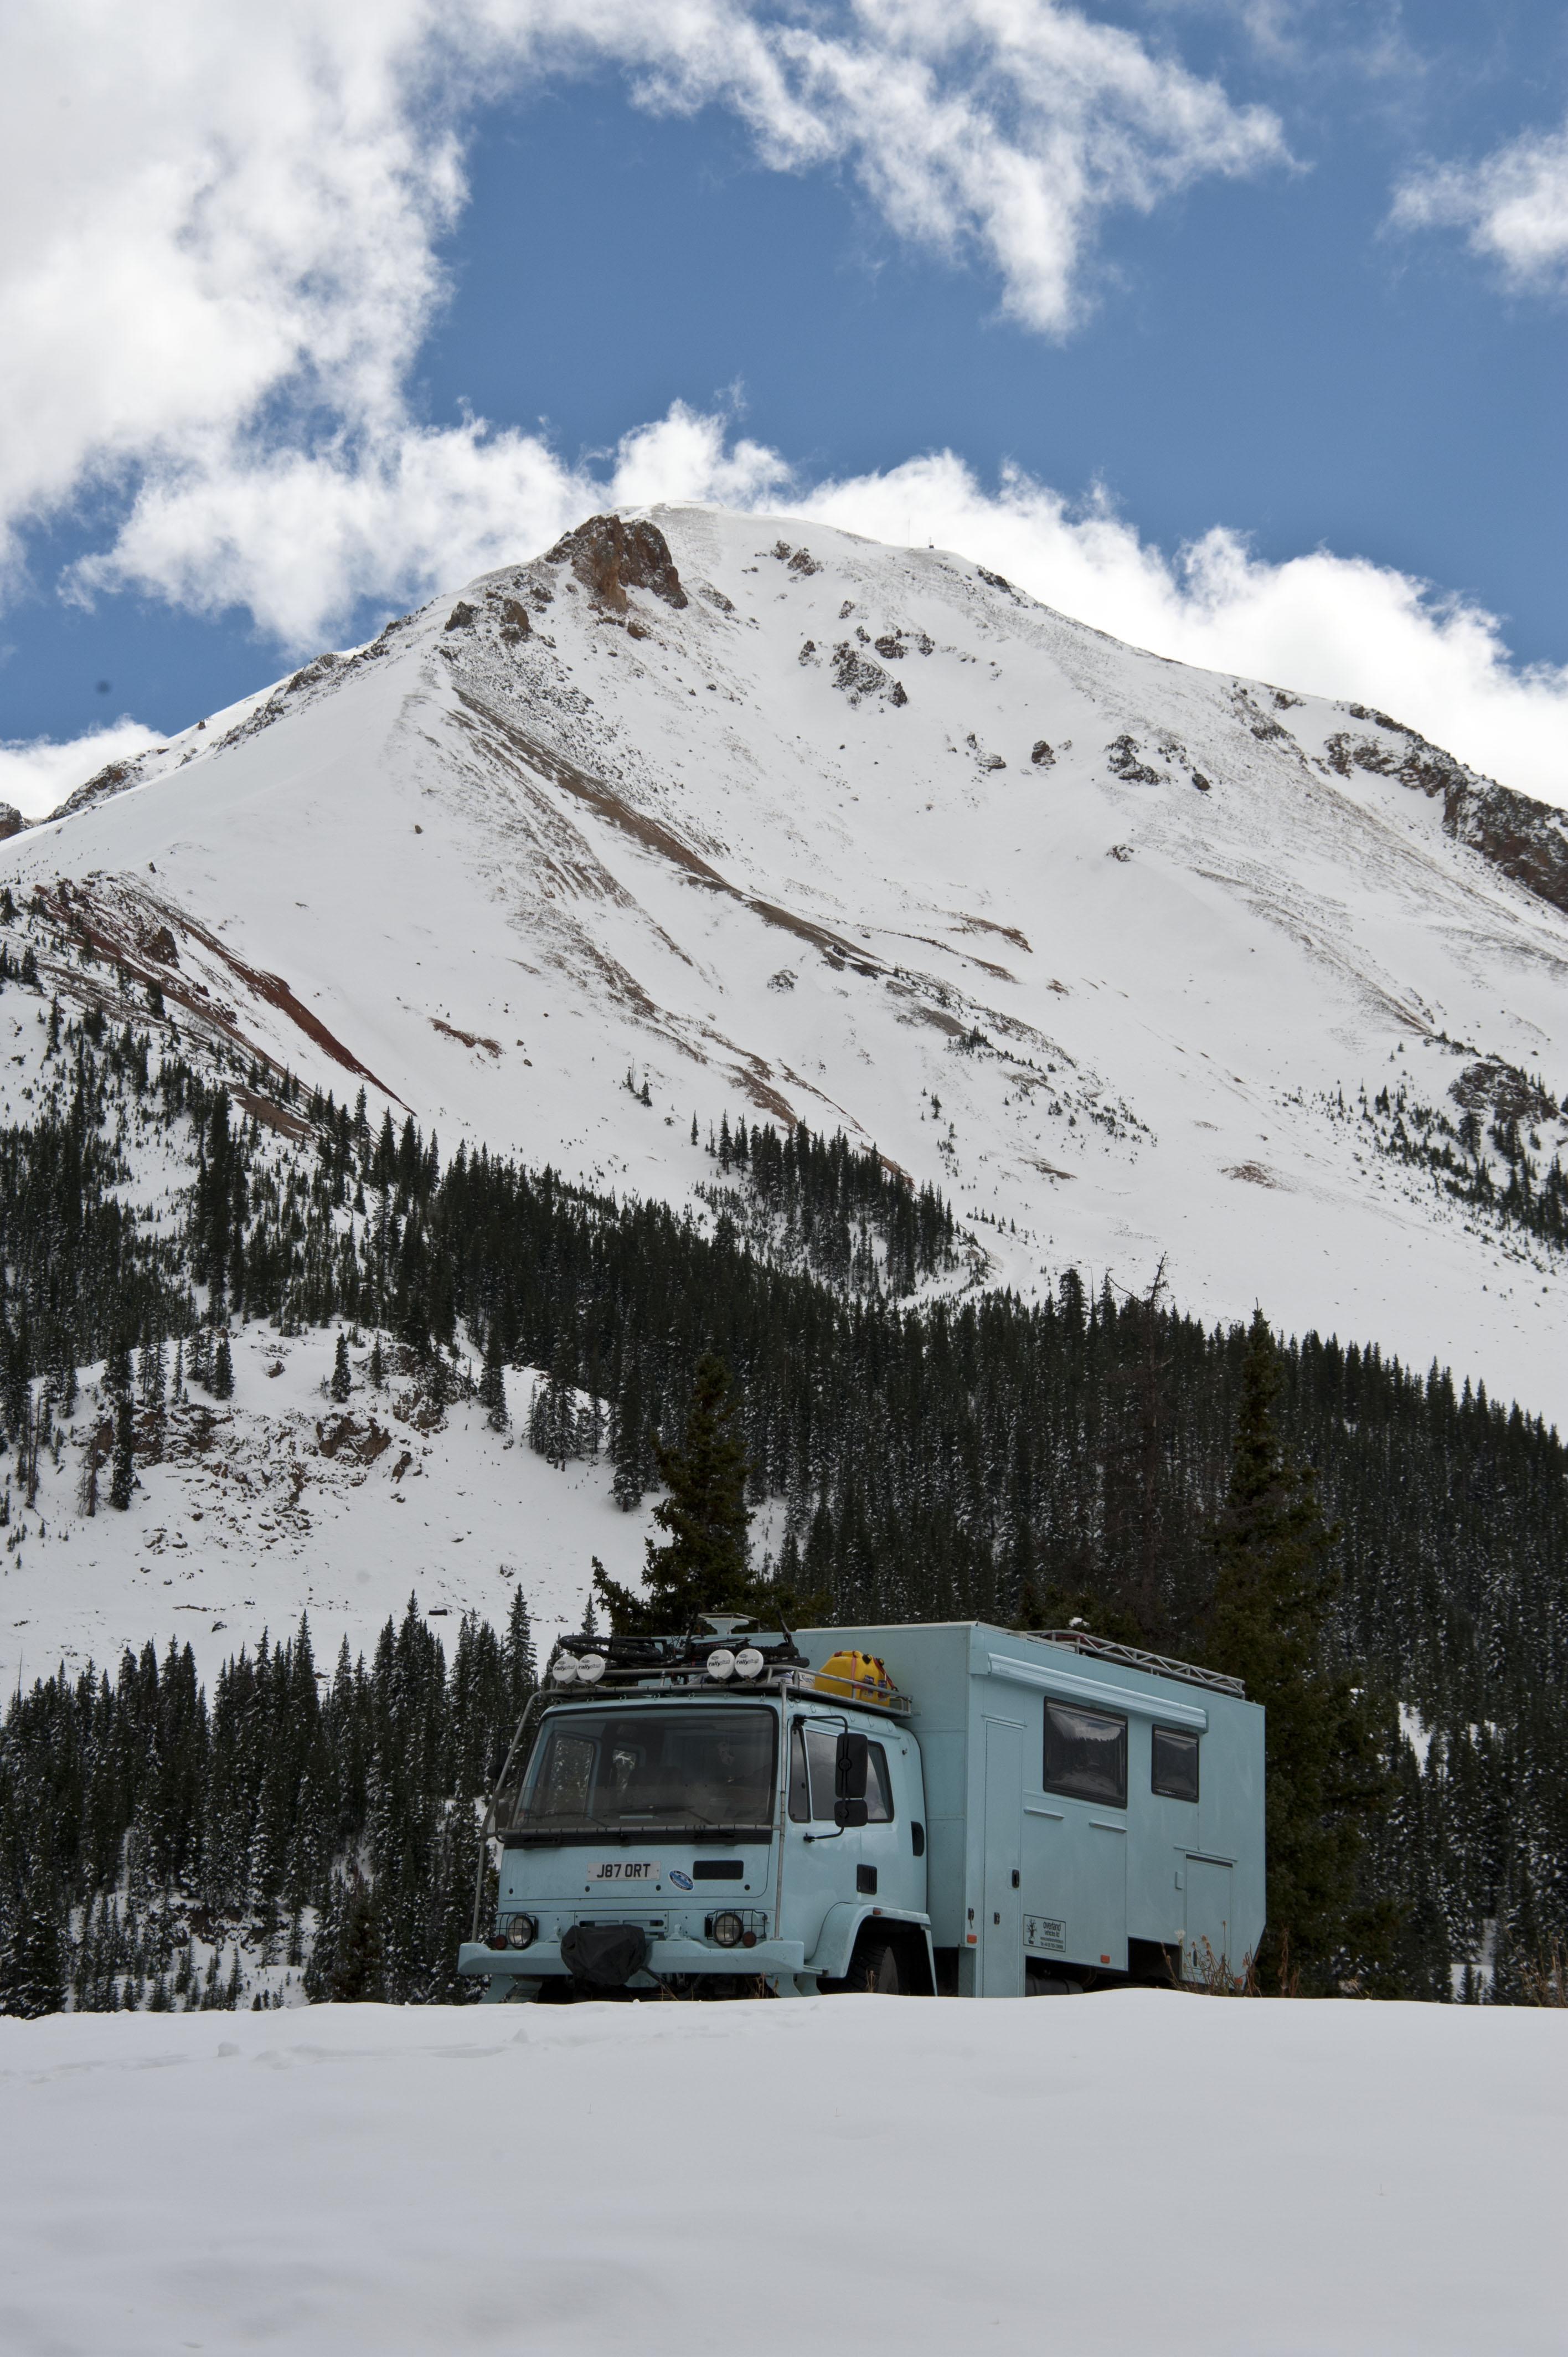 Ouray silverton and the mountains fromalaskatobrazil for The silverton